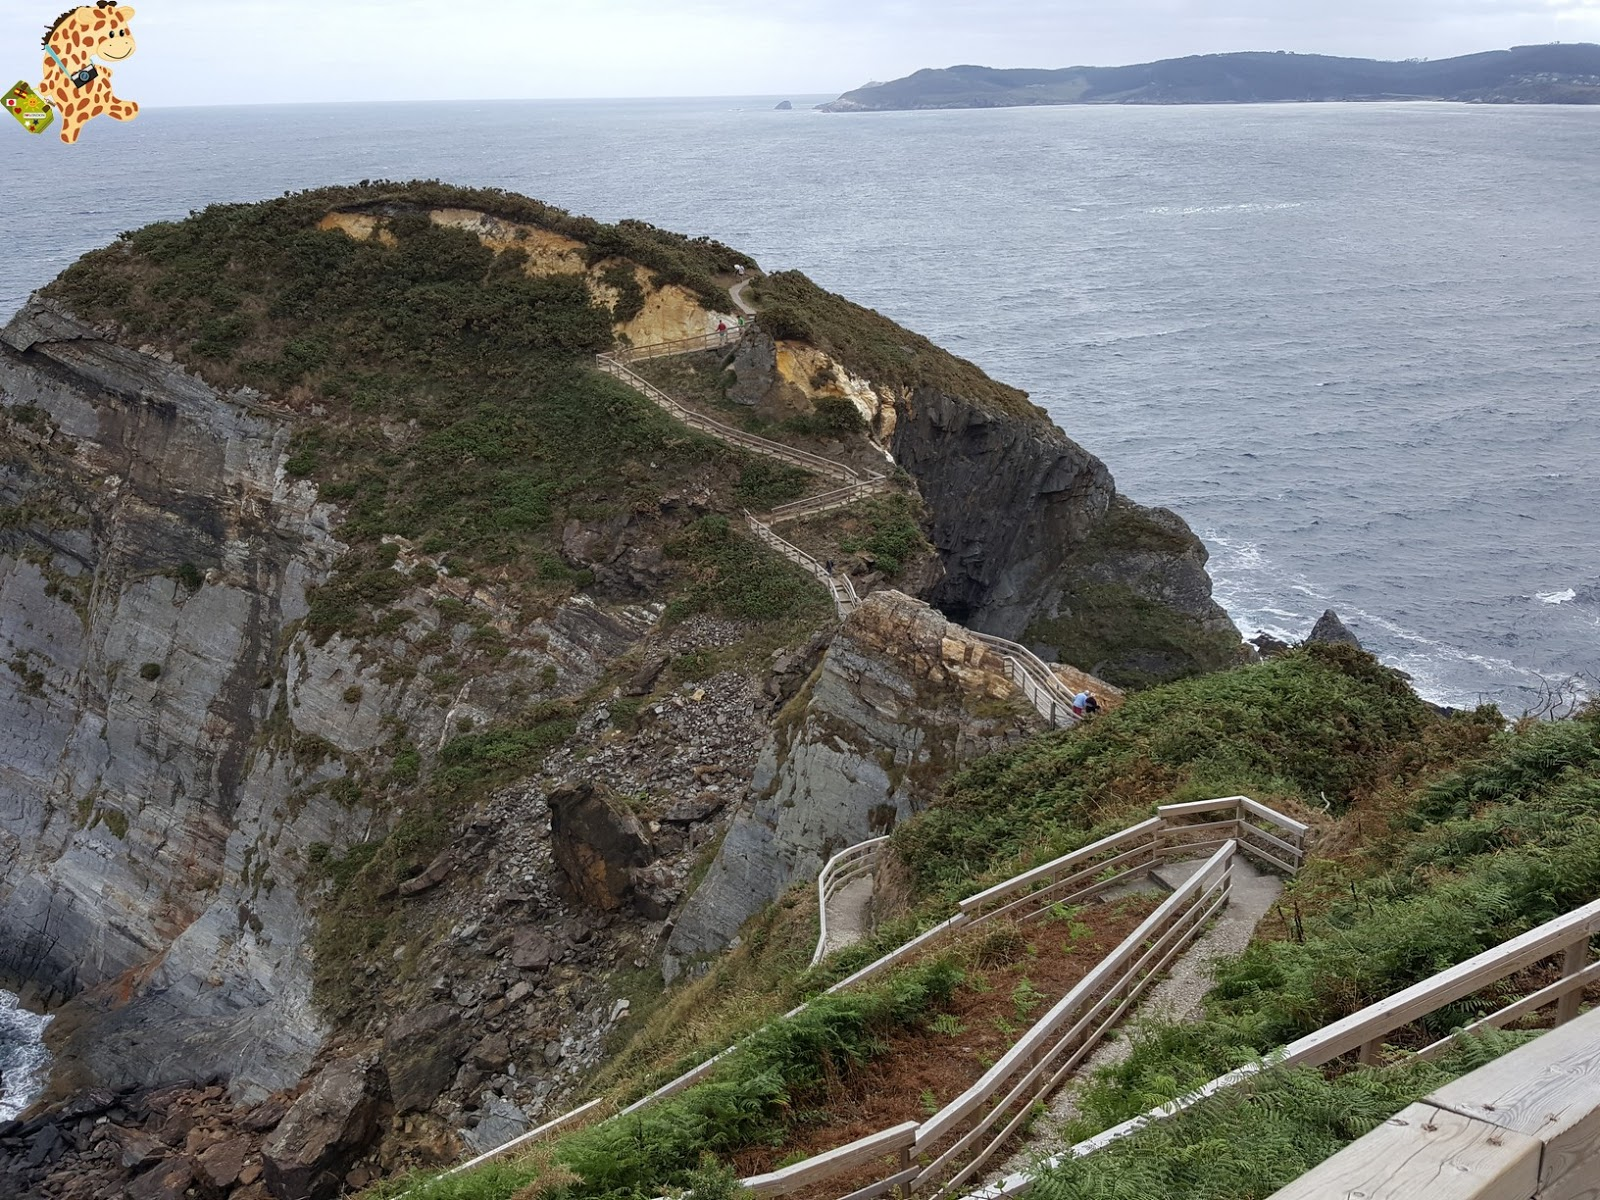 Cómo llegar y qué ver en O Fuciño do Porco (Punta Socastro) – O Vicedo